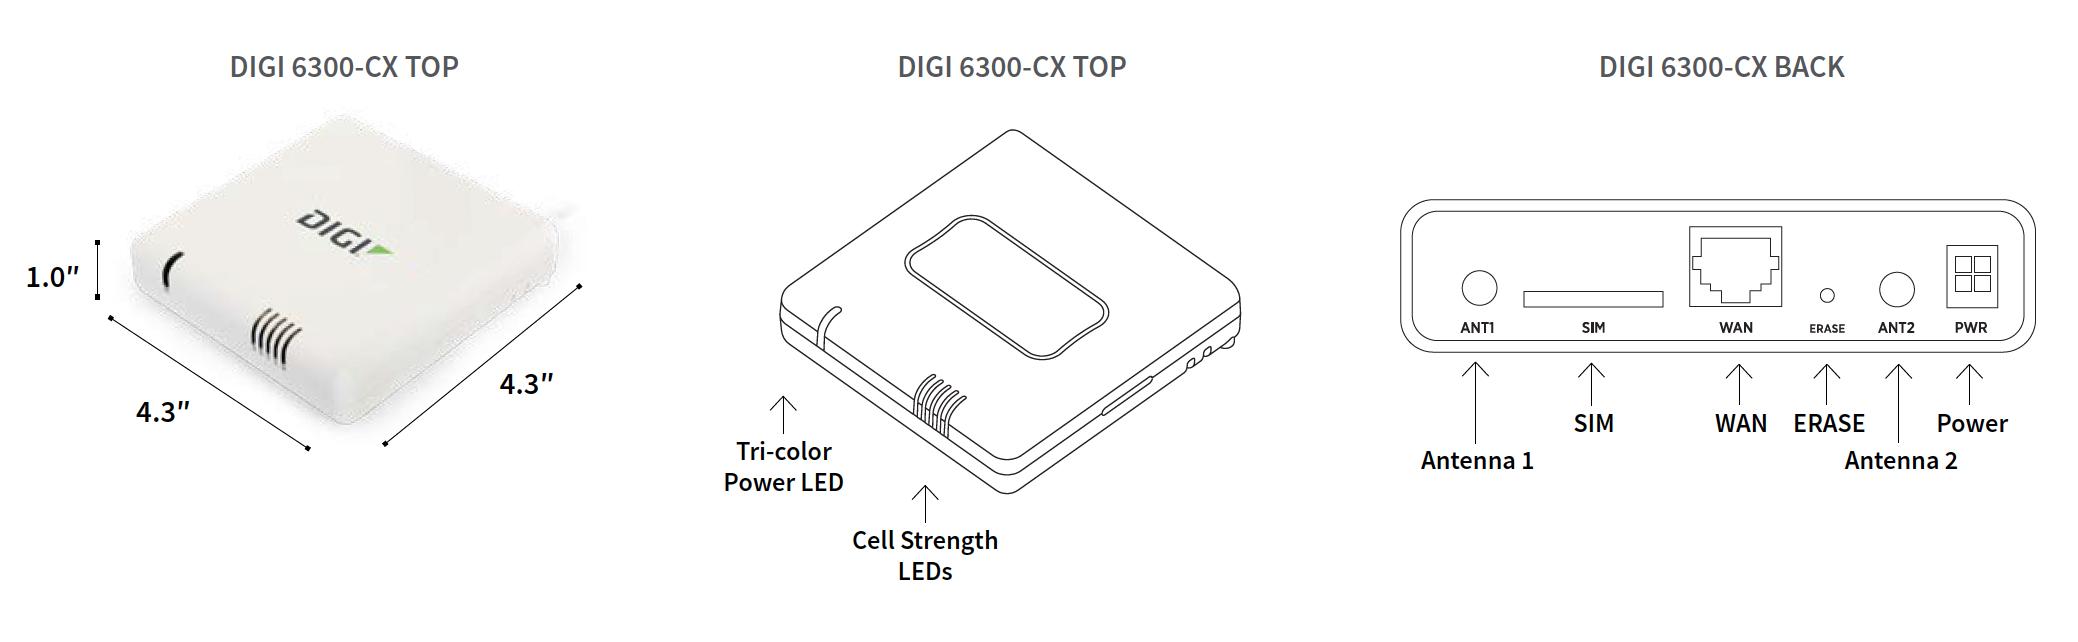 Digi 6300-CX LTE Cellular Extender | Digi International